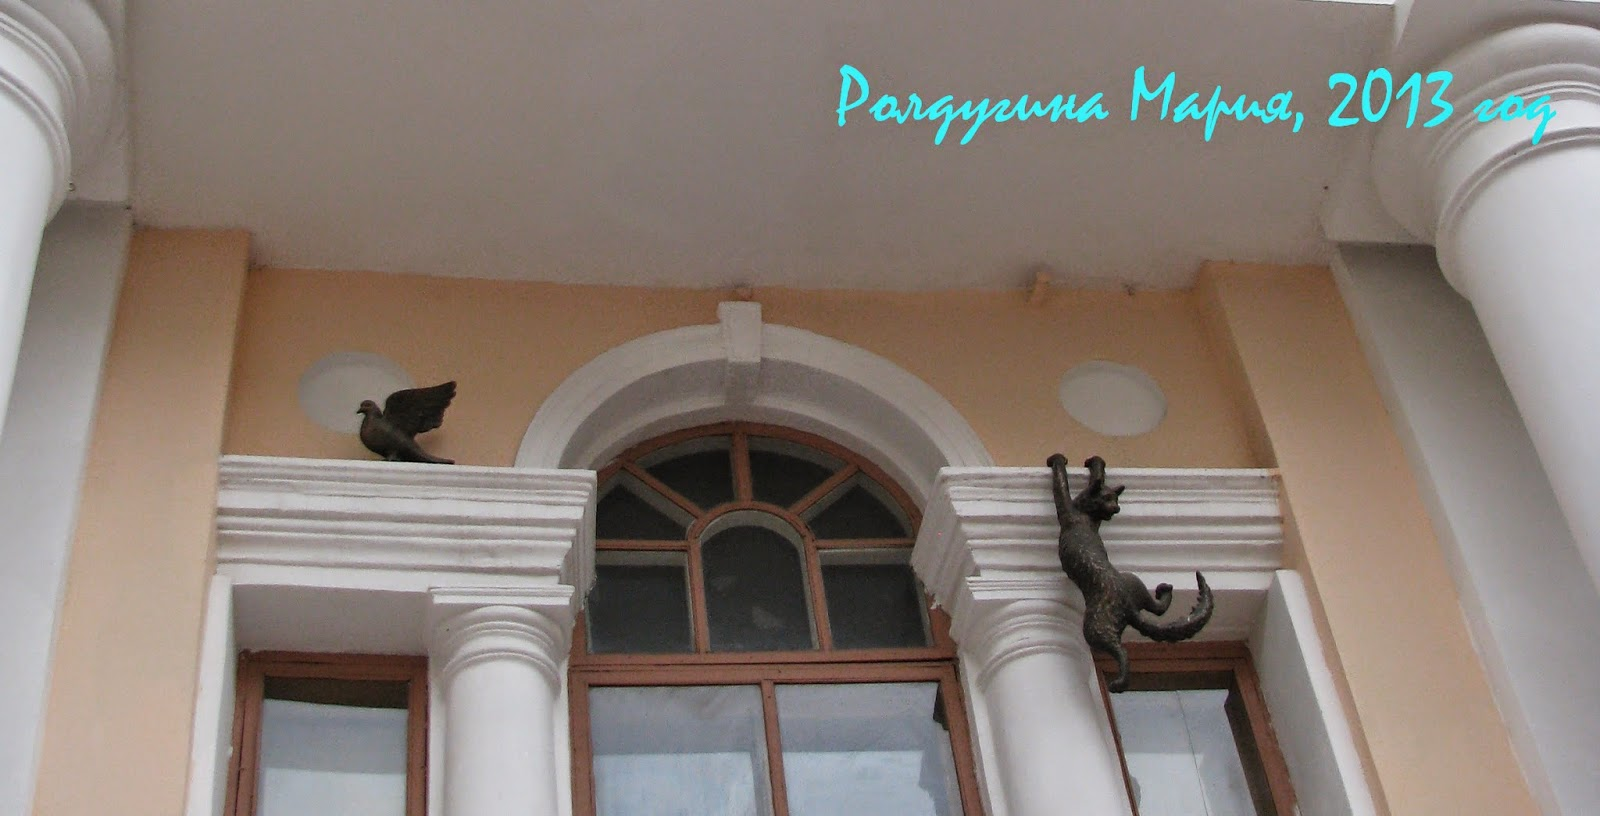 Нижний Новгород памятник кошкам